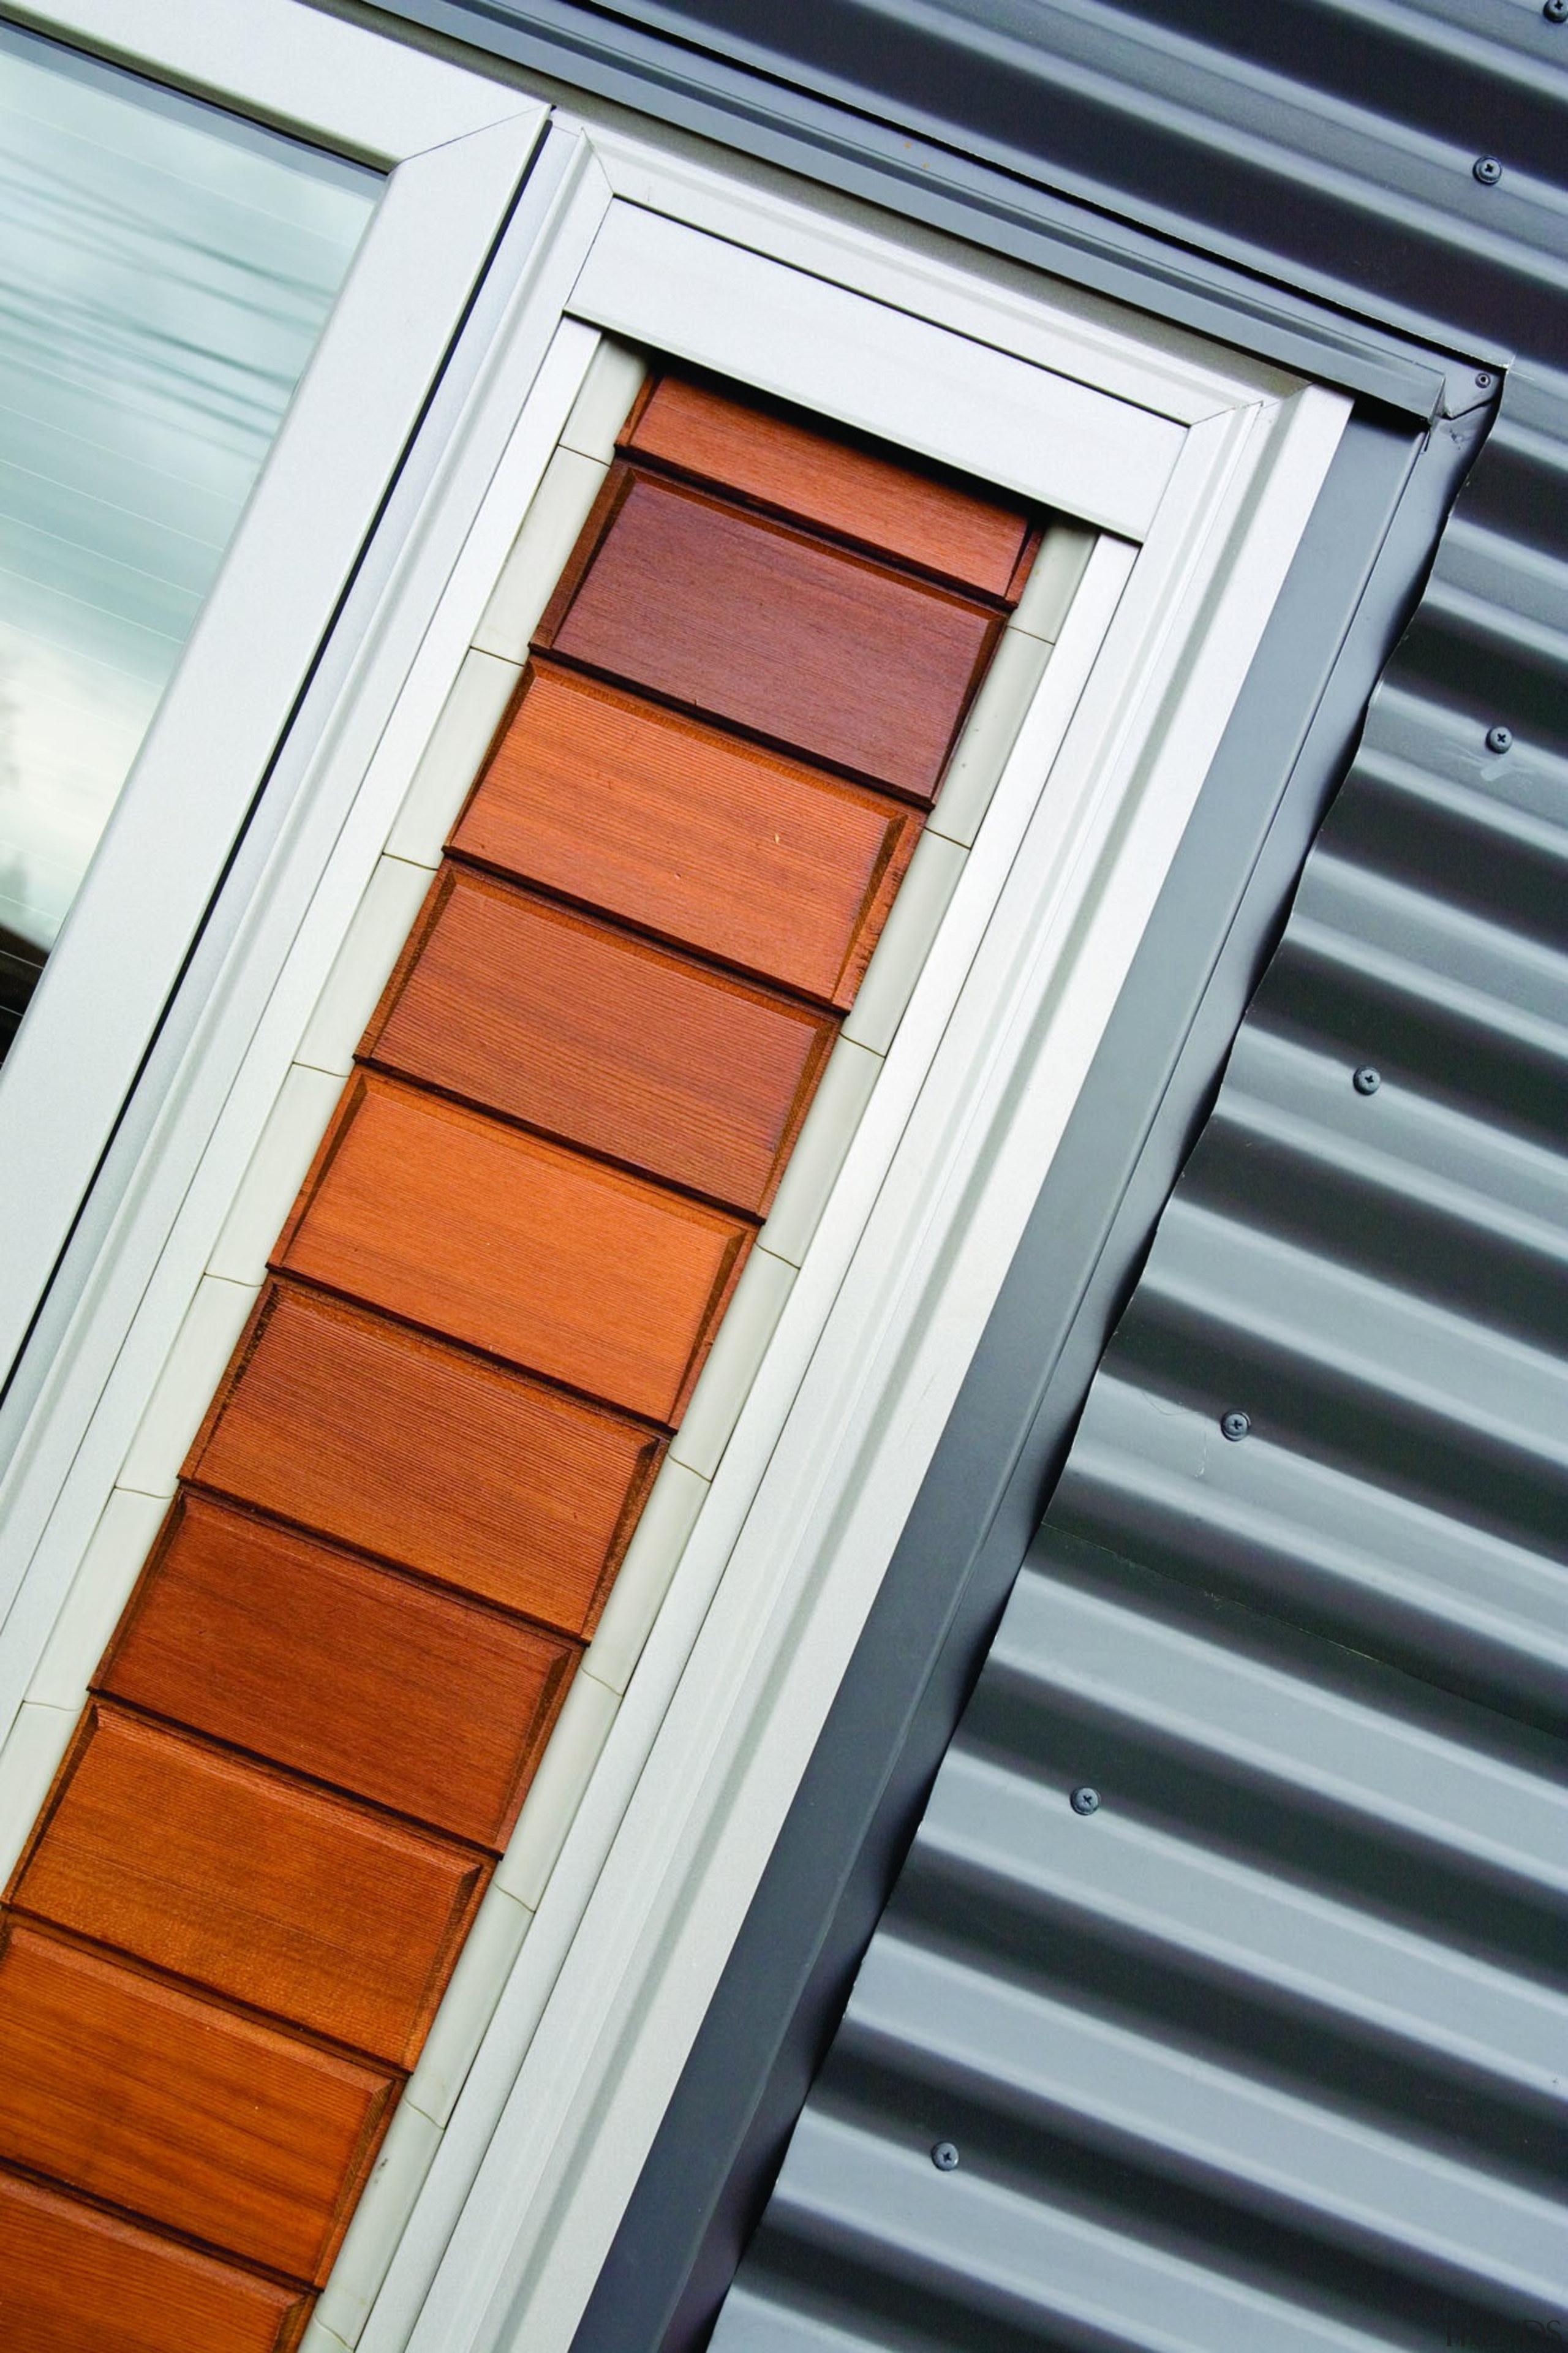 Rotorua Now - Corrugate Grey Friars - Close daylighting, facade, house, line, roof, siding, window, wood, wood stain, gray